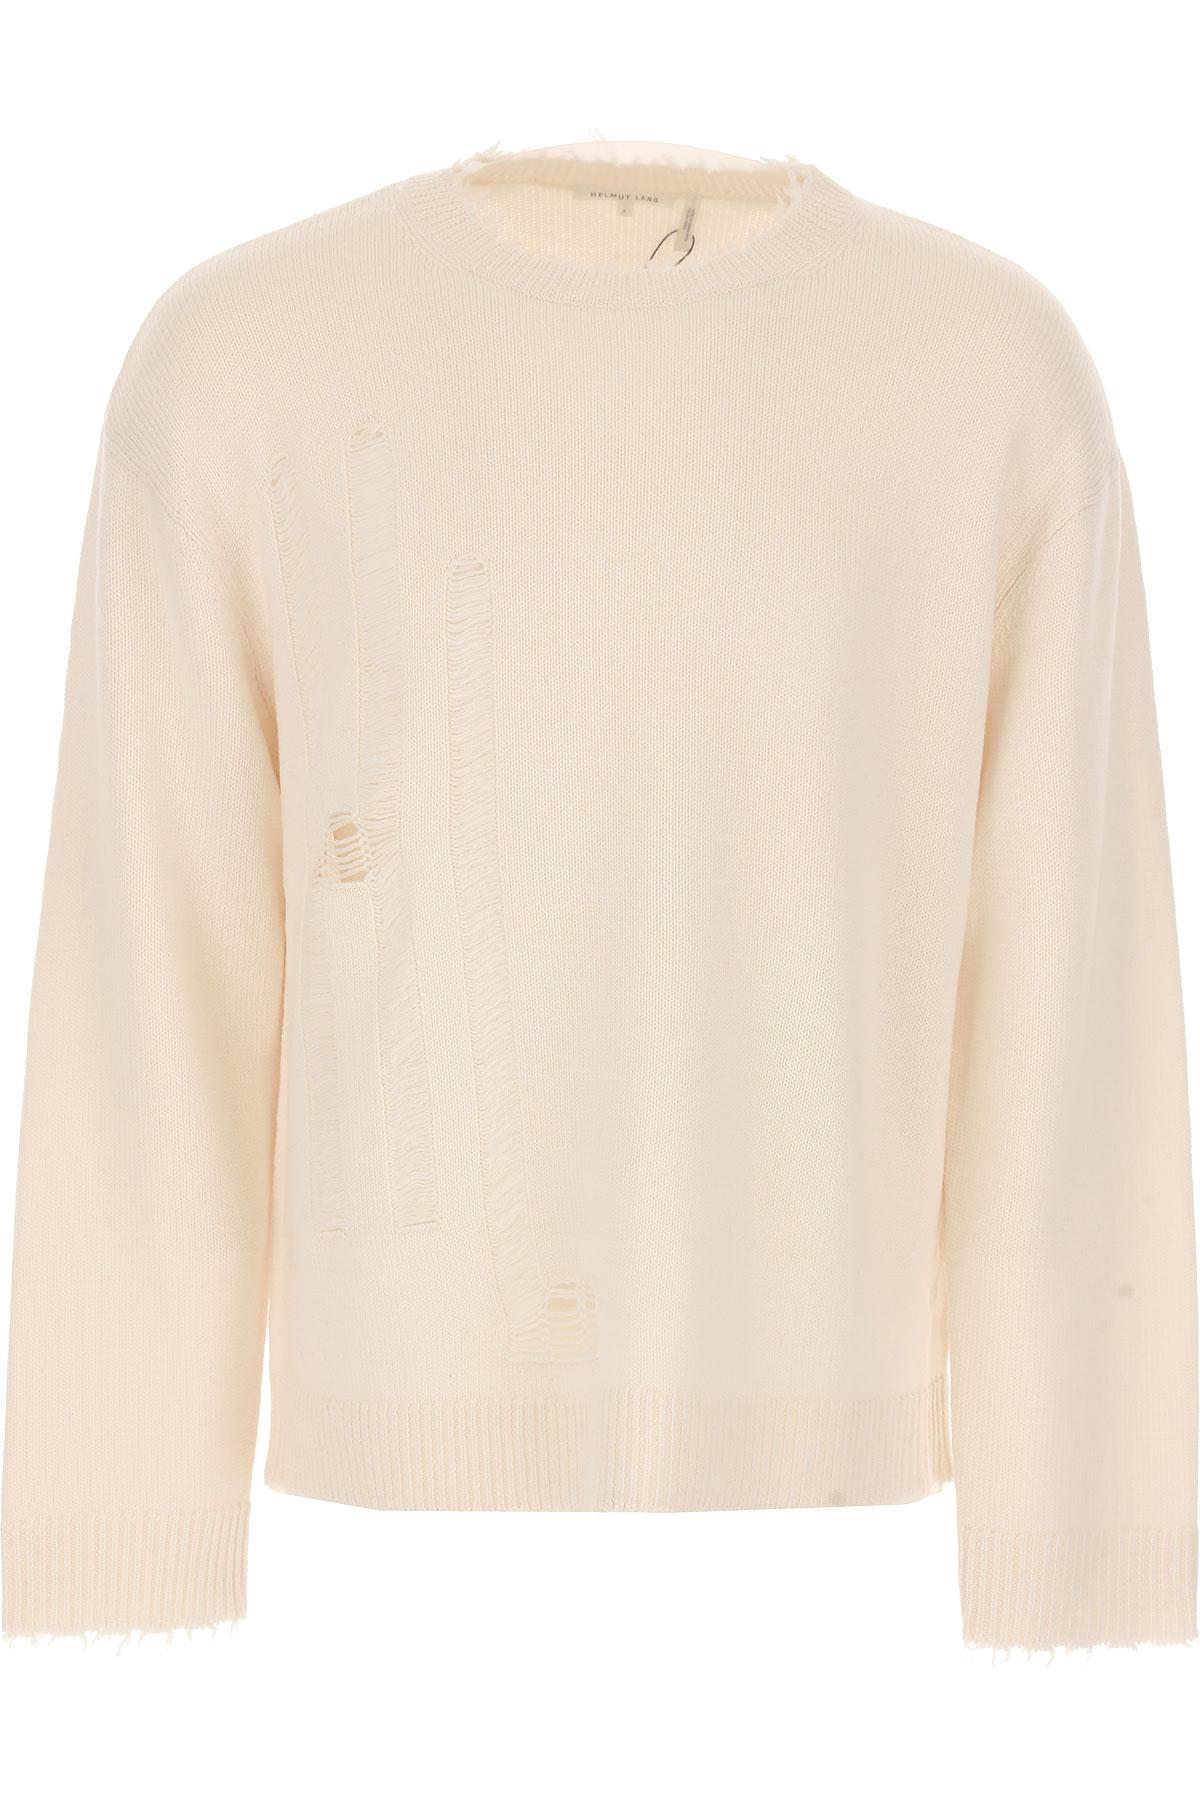 Image of Helmut Lang Sweater for Men Jumper, White, Wool, 2017, L M